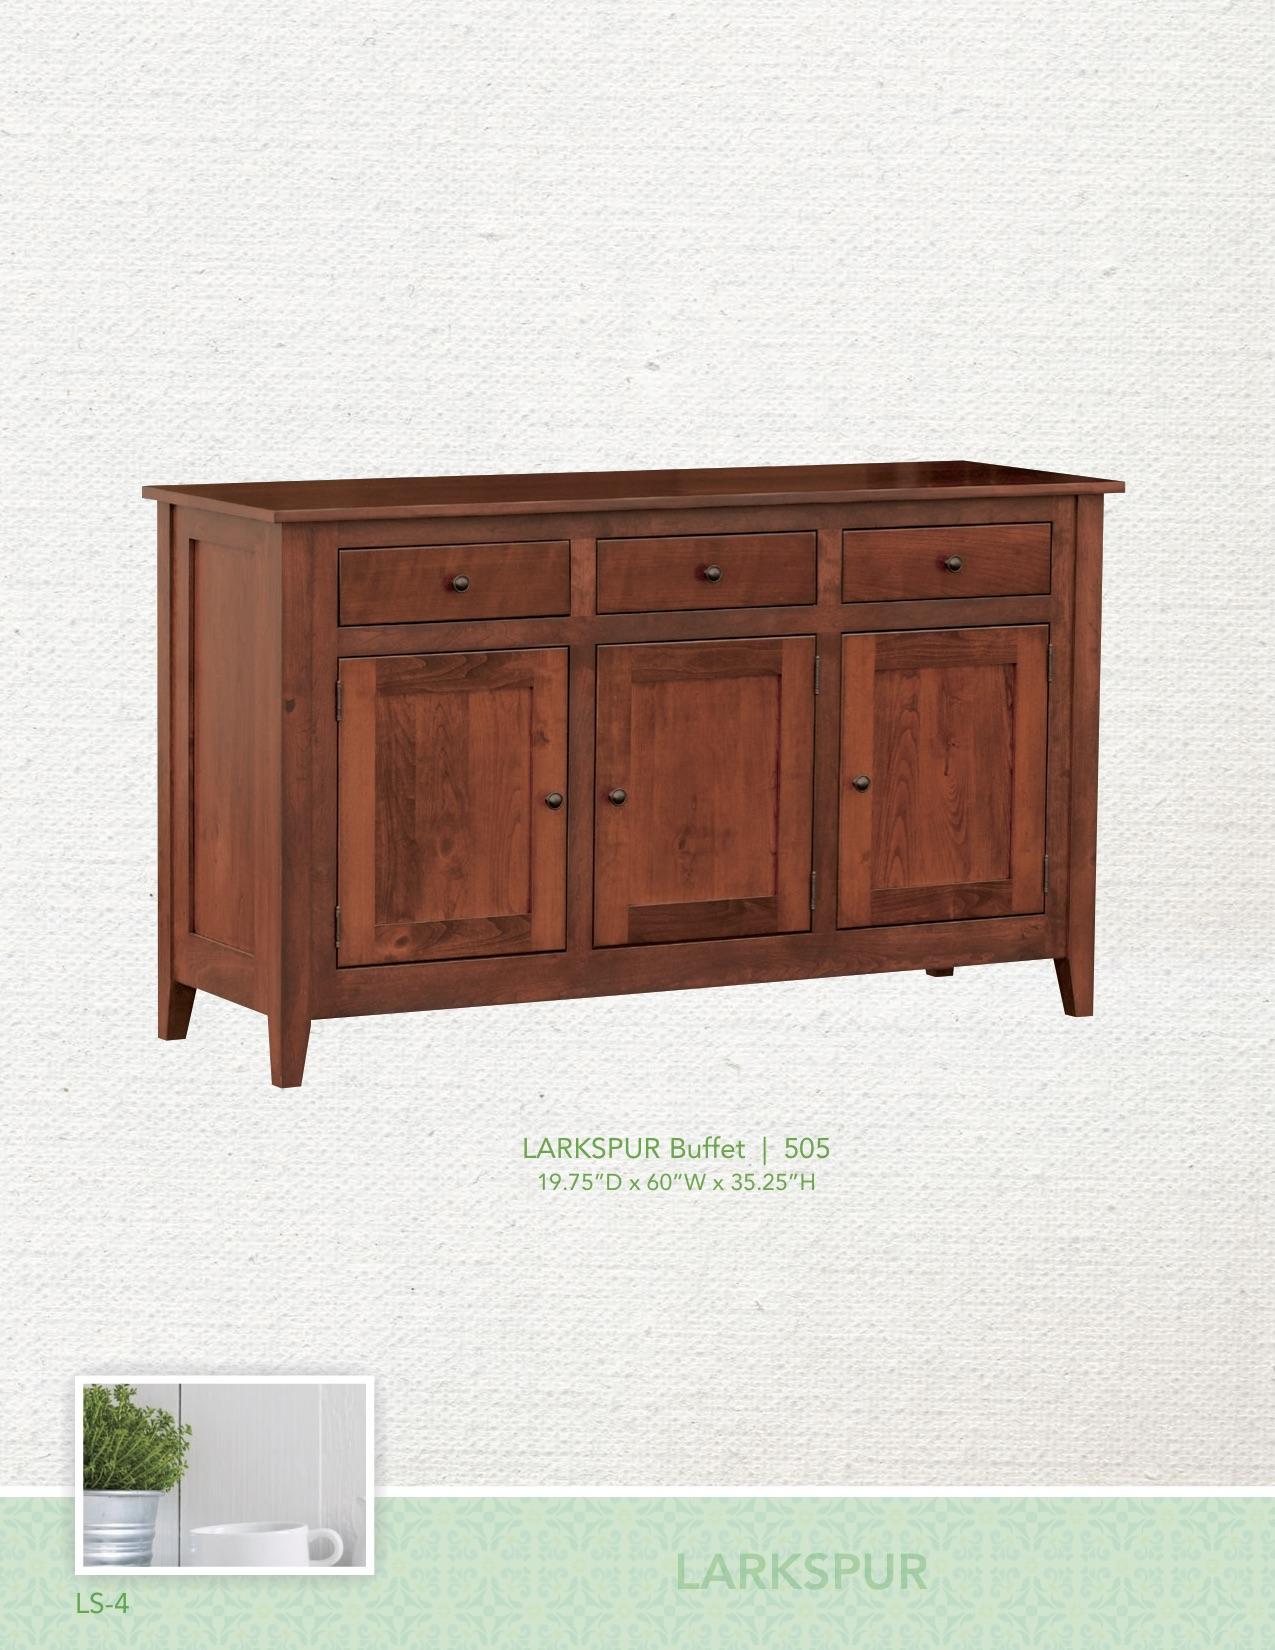 Schlabachs Furniture - Homestead Furniture - Berlin Ohio